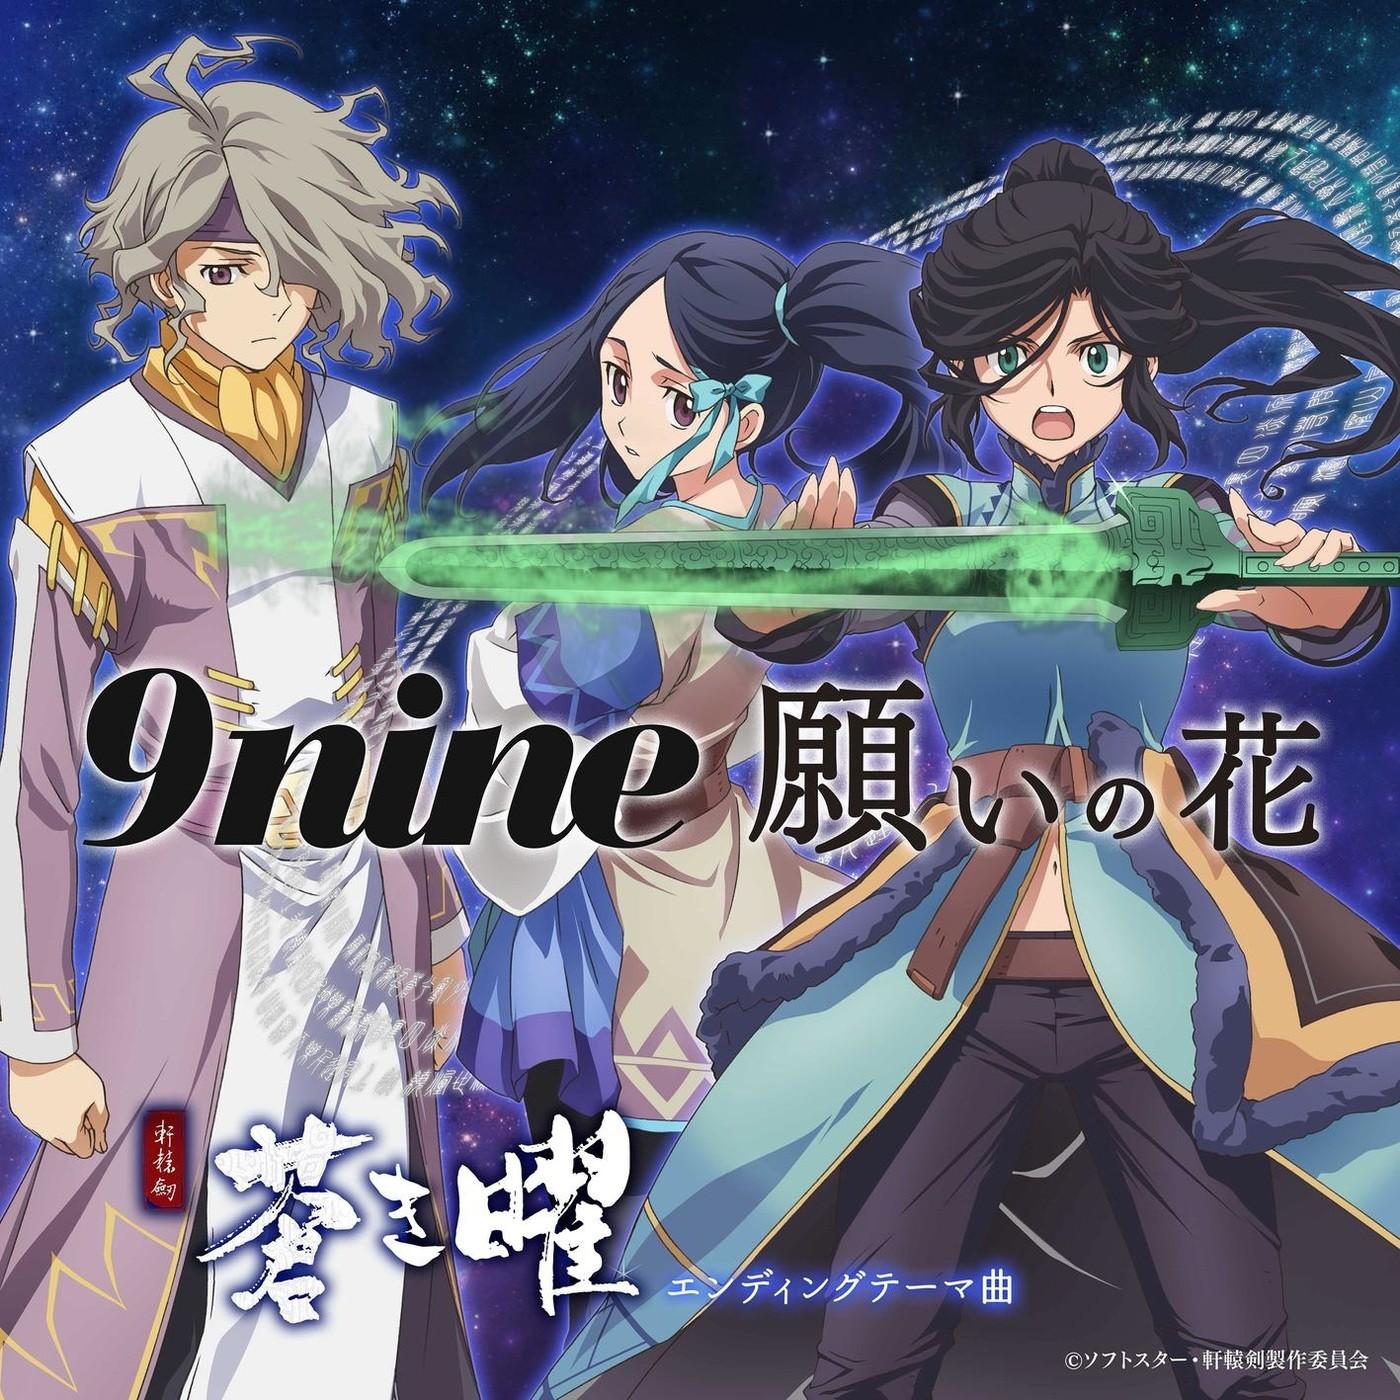 9nine – 願いの花 [FLAC + AAC 256 / WEB] [2018.10.15]